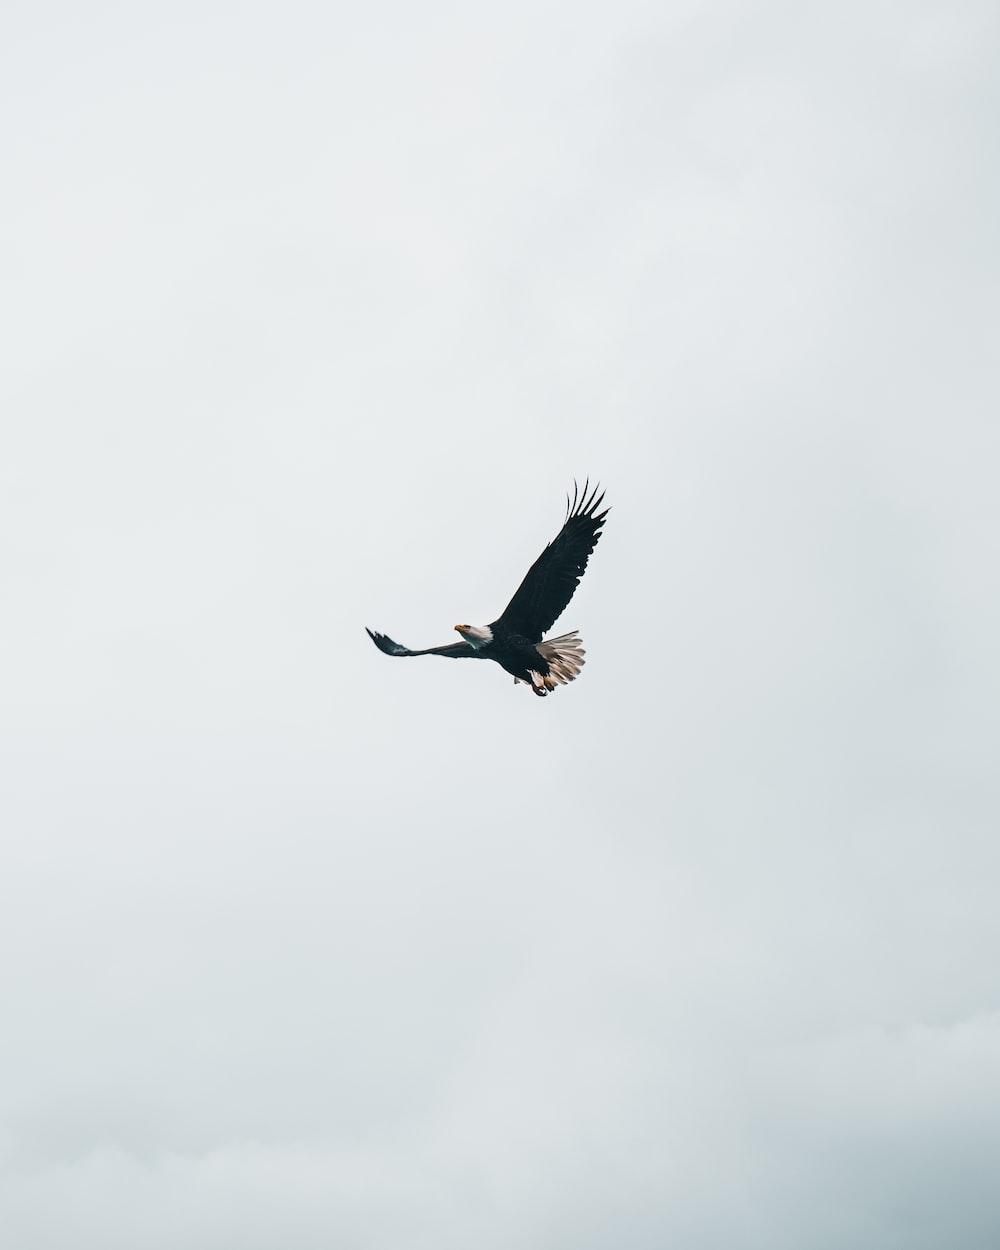 birds pictures download free images on unsplash